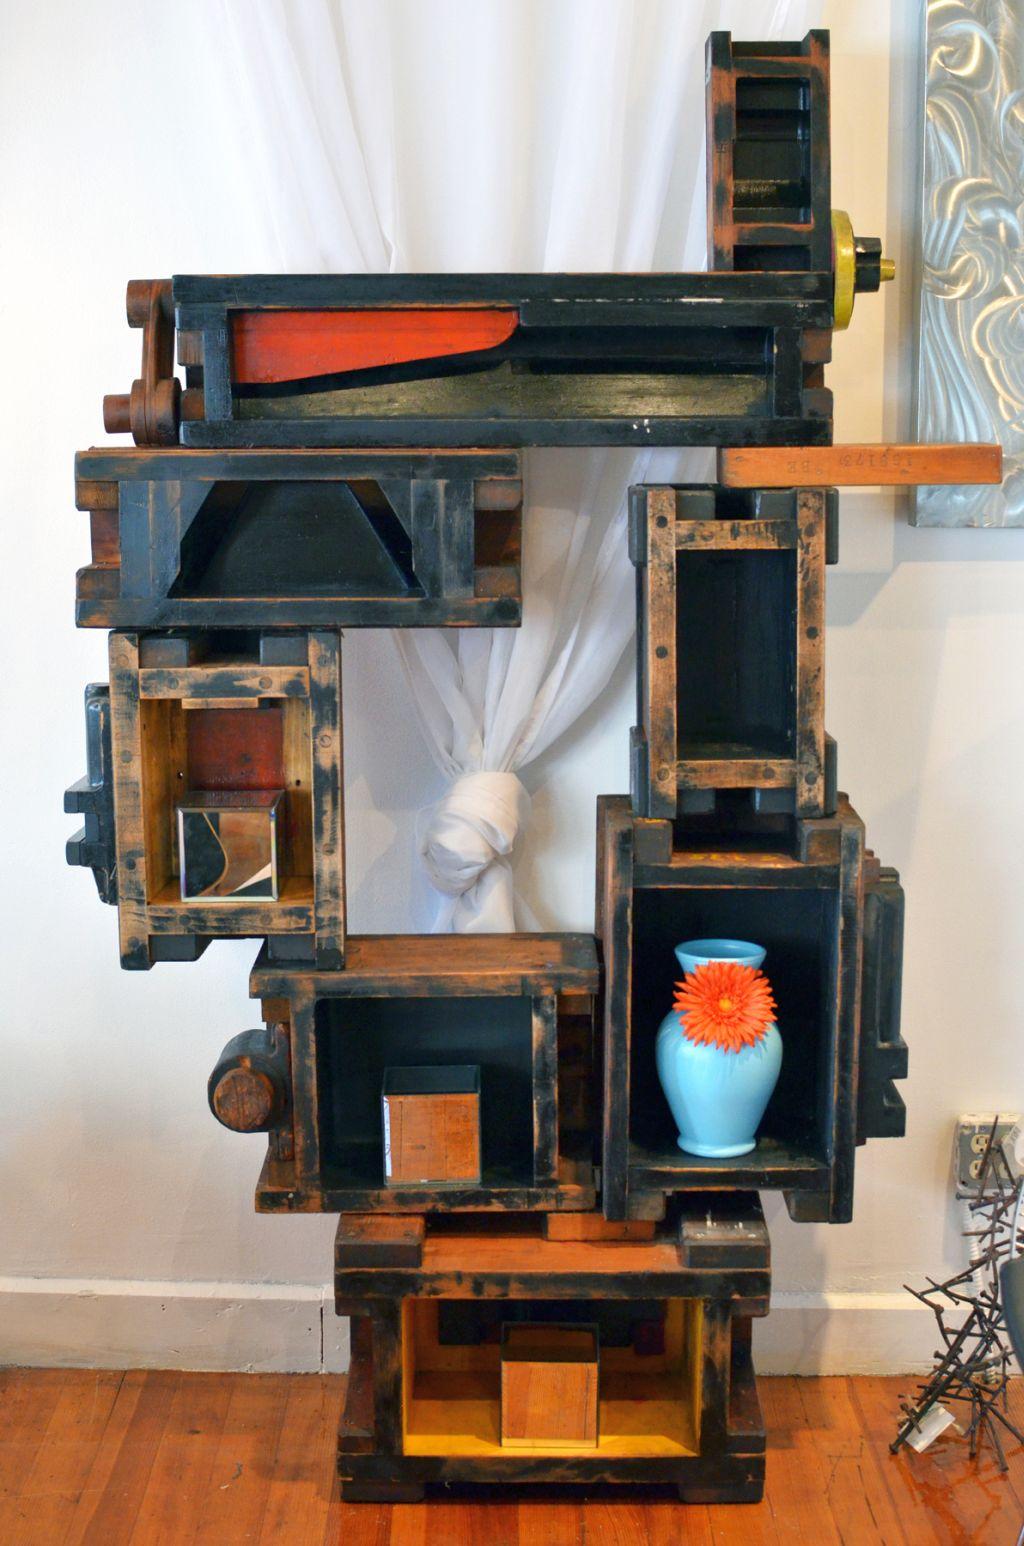 Steampunk Style Vintage Industrial Bookcase Designs